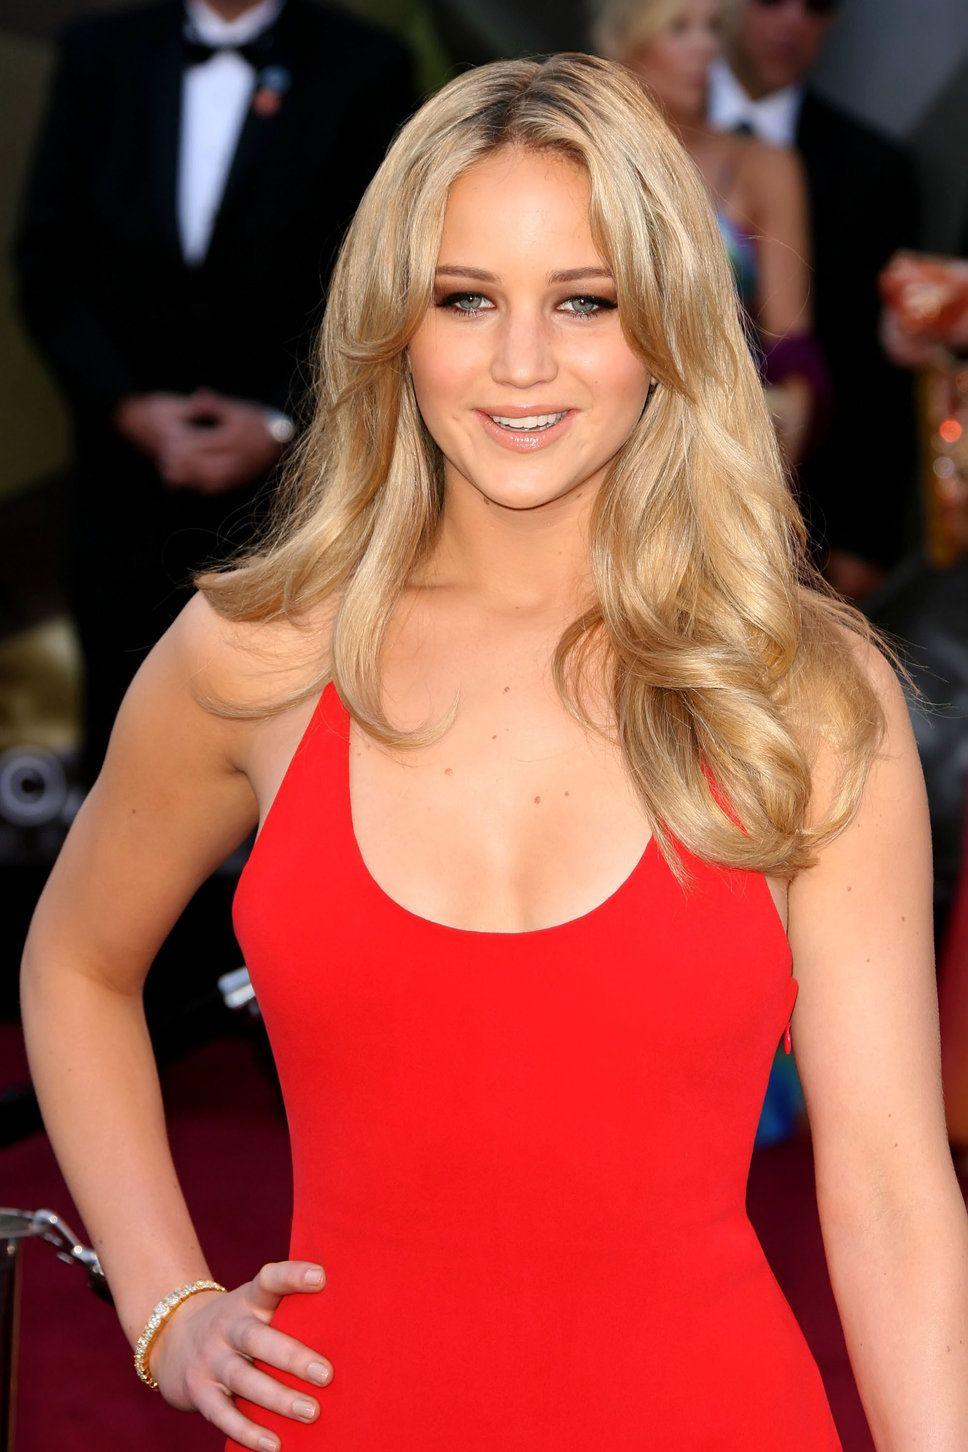 Jennifer Lawrence Blondehair Jennifer Lawrence Red Dress Blond